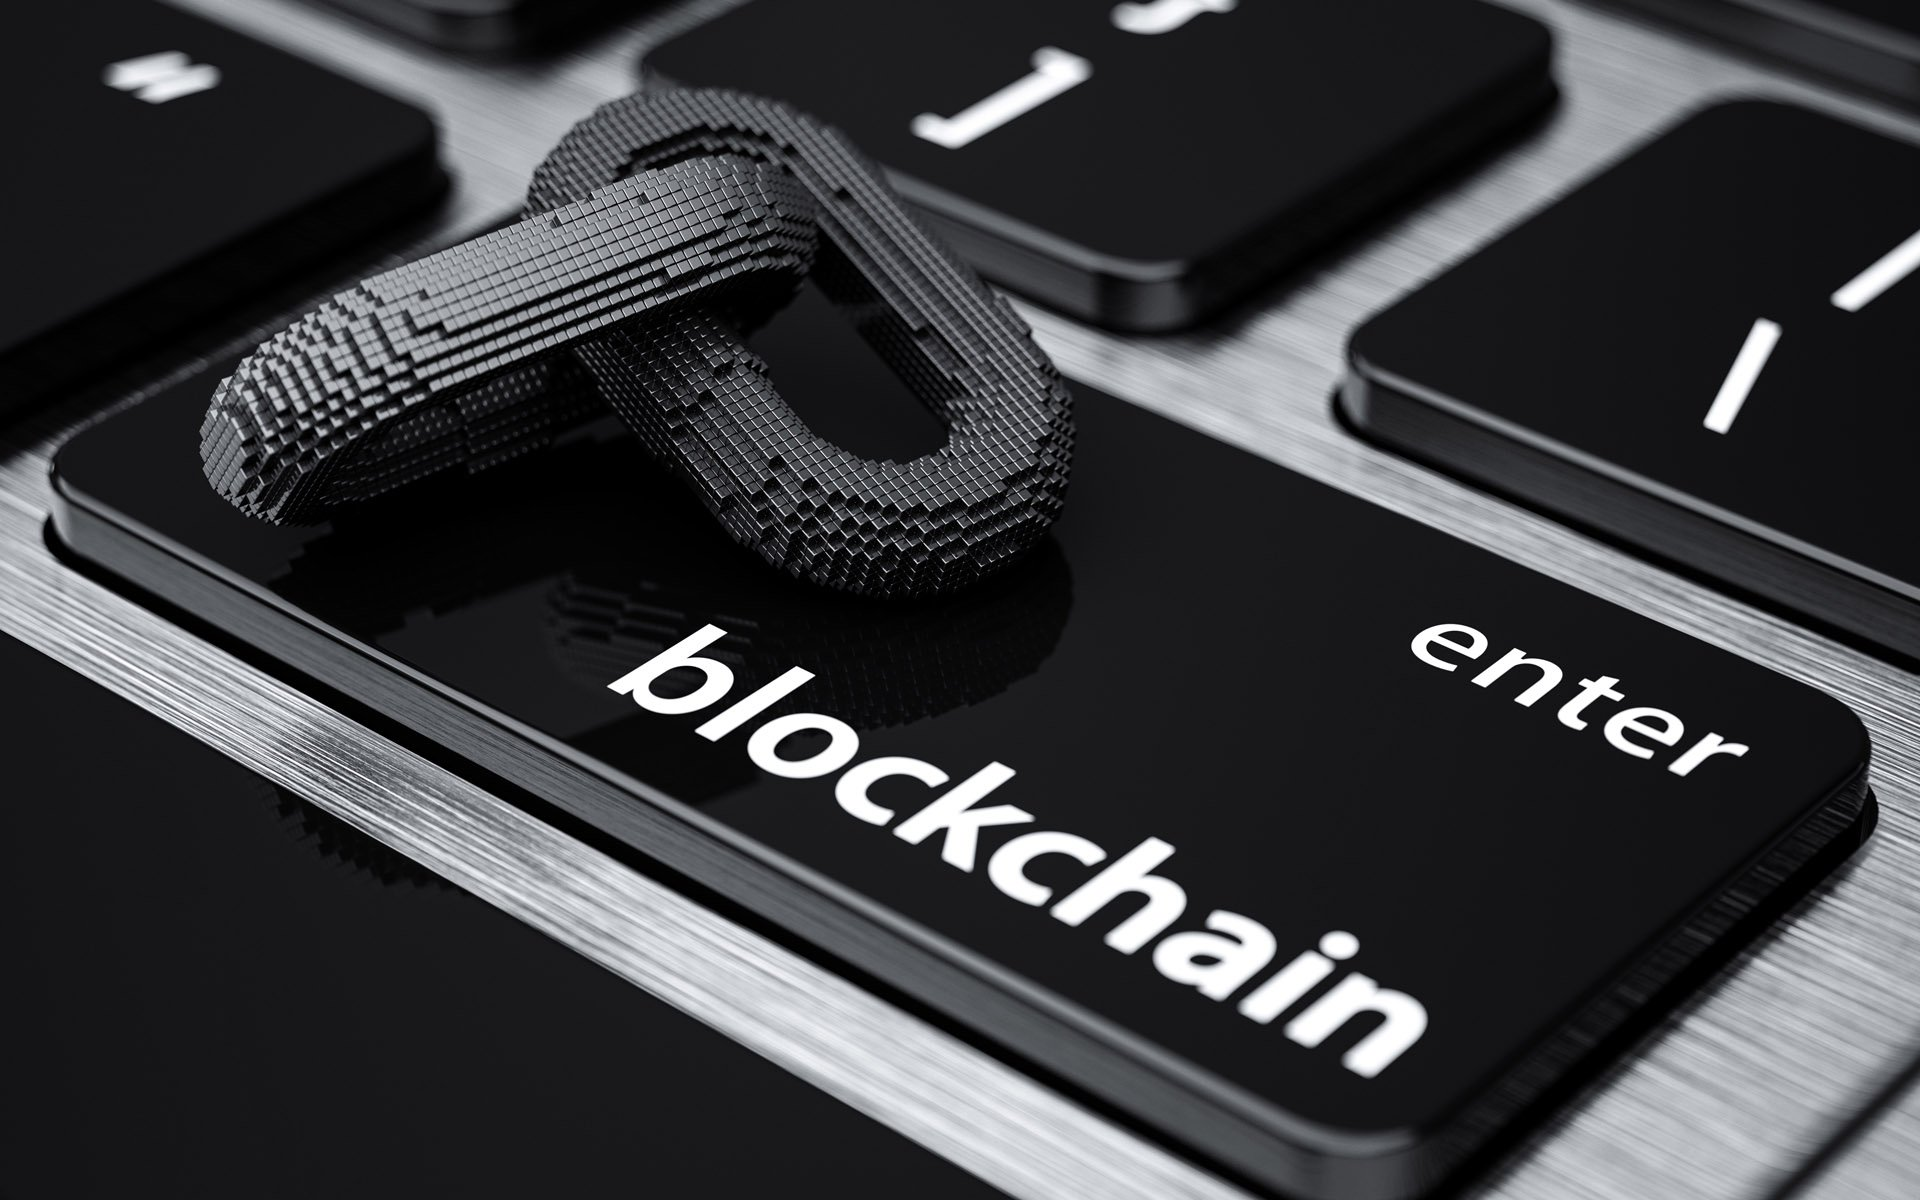 Blockchain Job Industry Sees Sustained Uptick Despite Volatile Crypto Markets